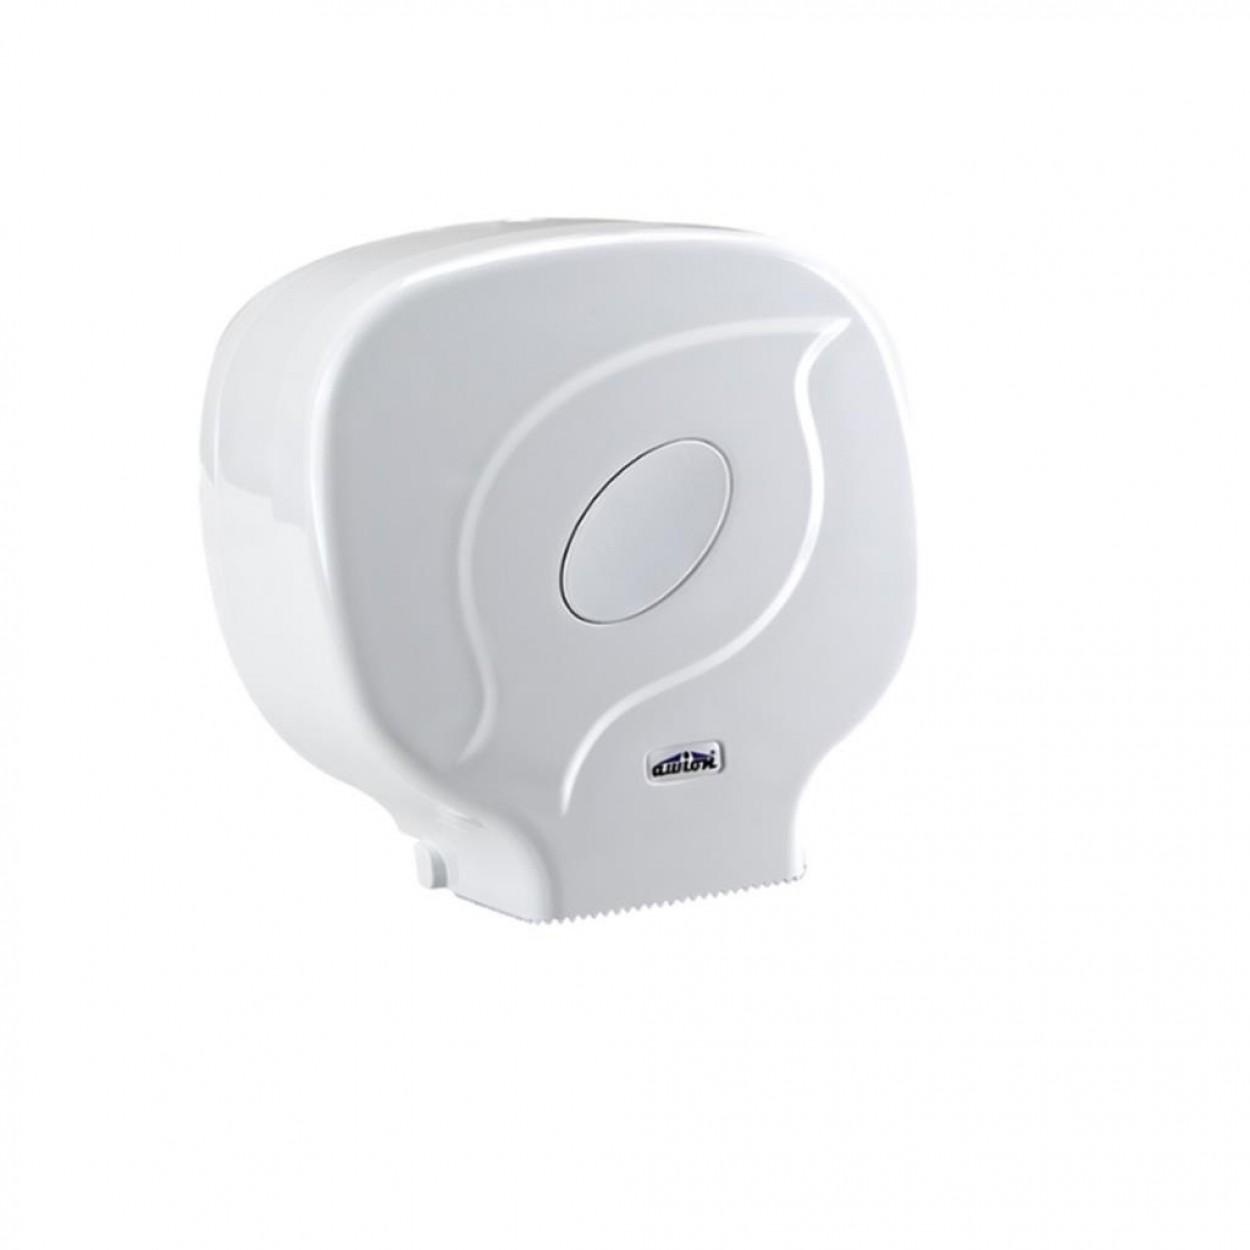 Euro Jumbo Rulo WC Kağıt Dispenseri Beyaz